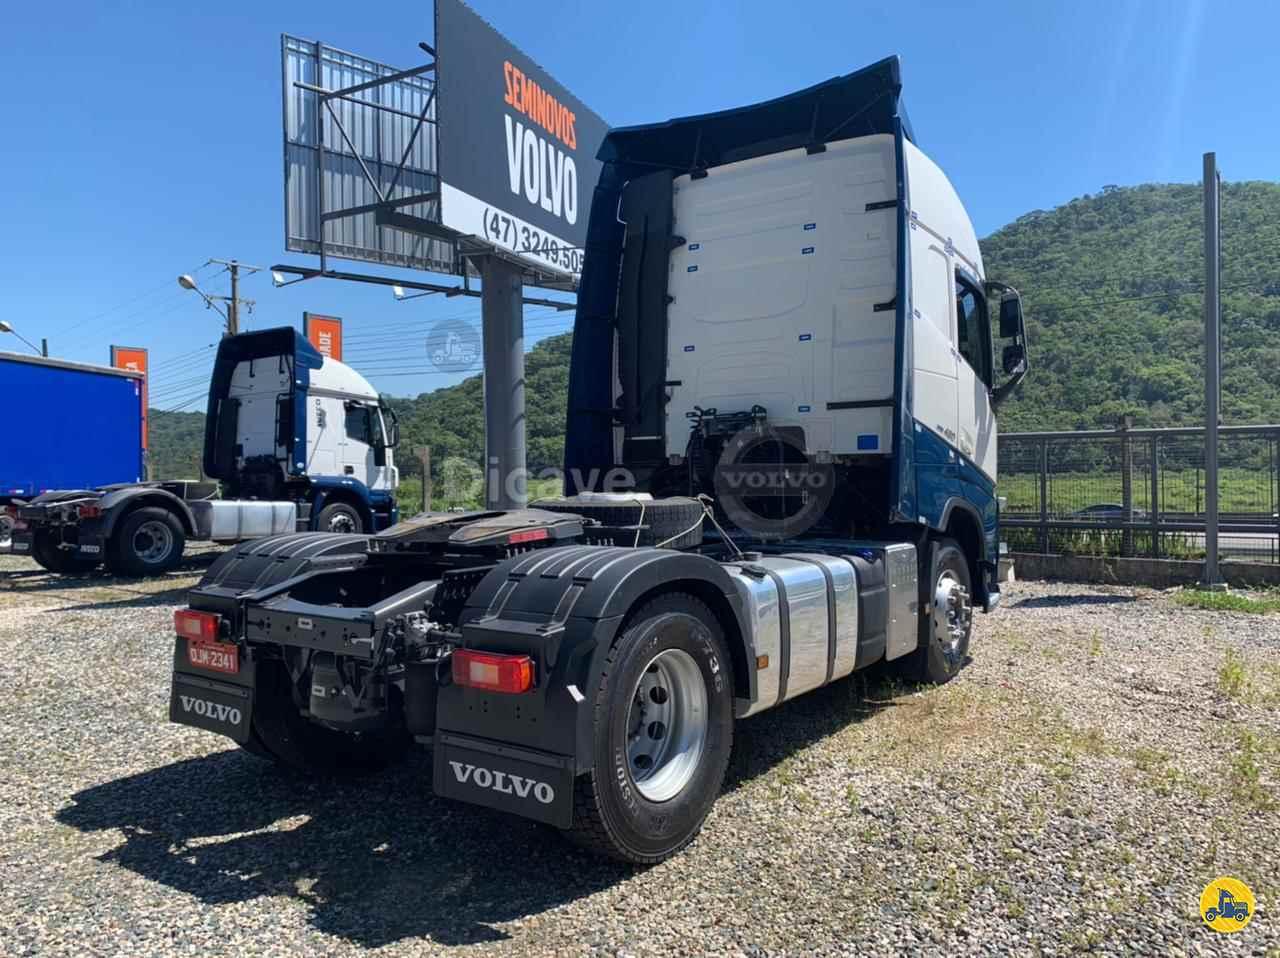 VOLVO VOLVO FH 420 300856km 2018/2018 Dicave Viking Center - Volvo